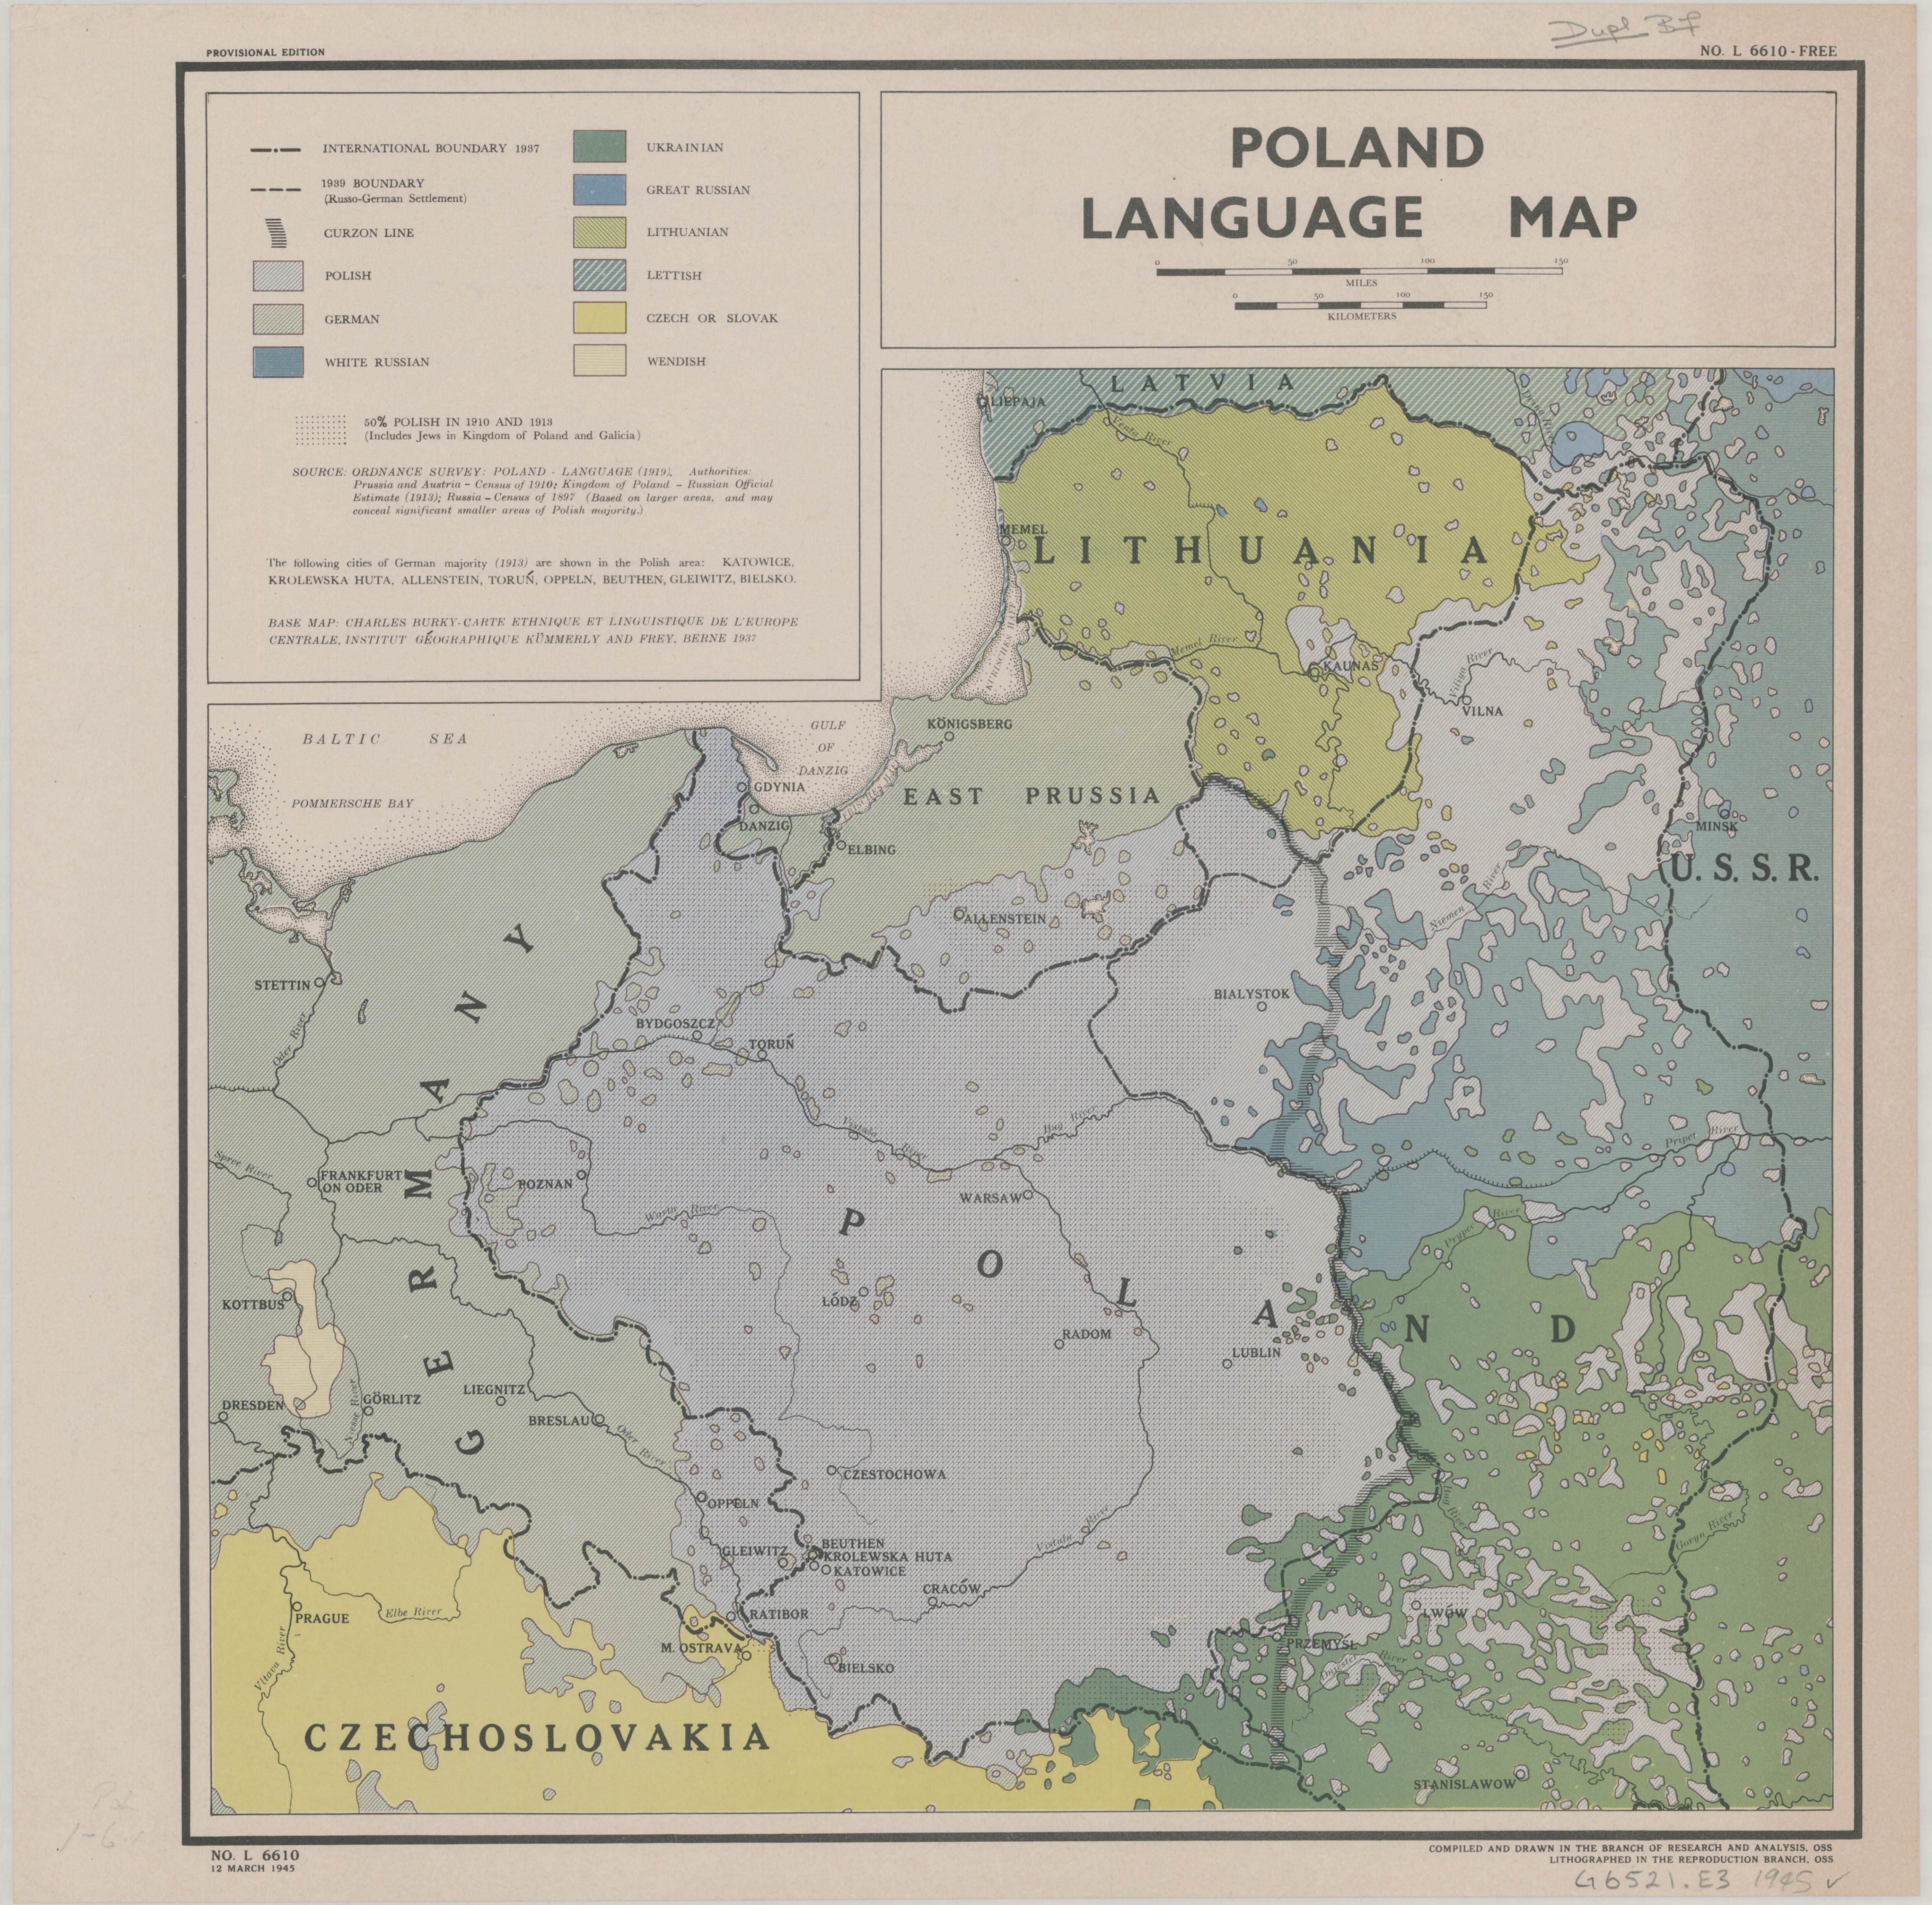 Poland language map 1945 maps pinterest poland language map 1945 sciox Images